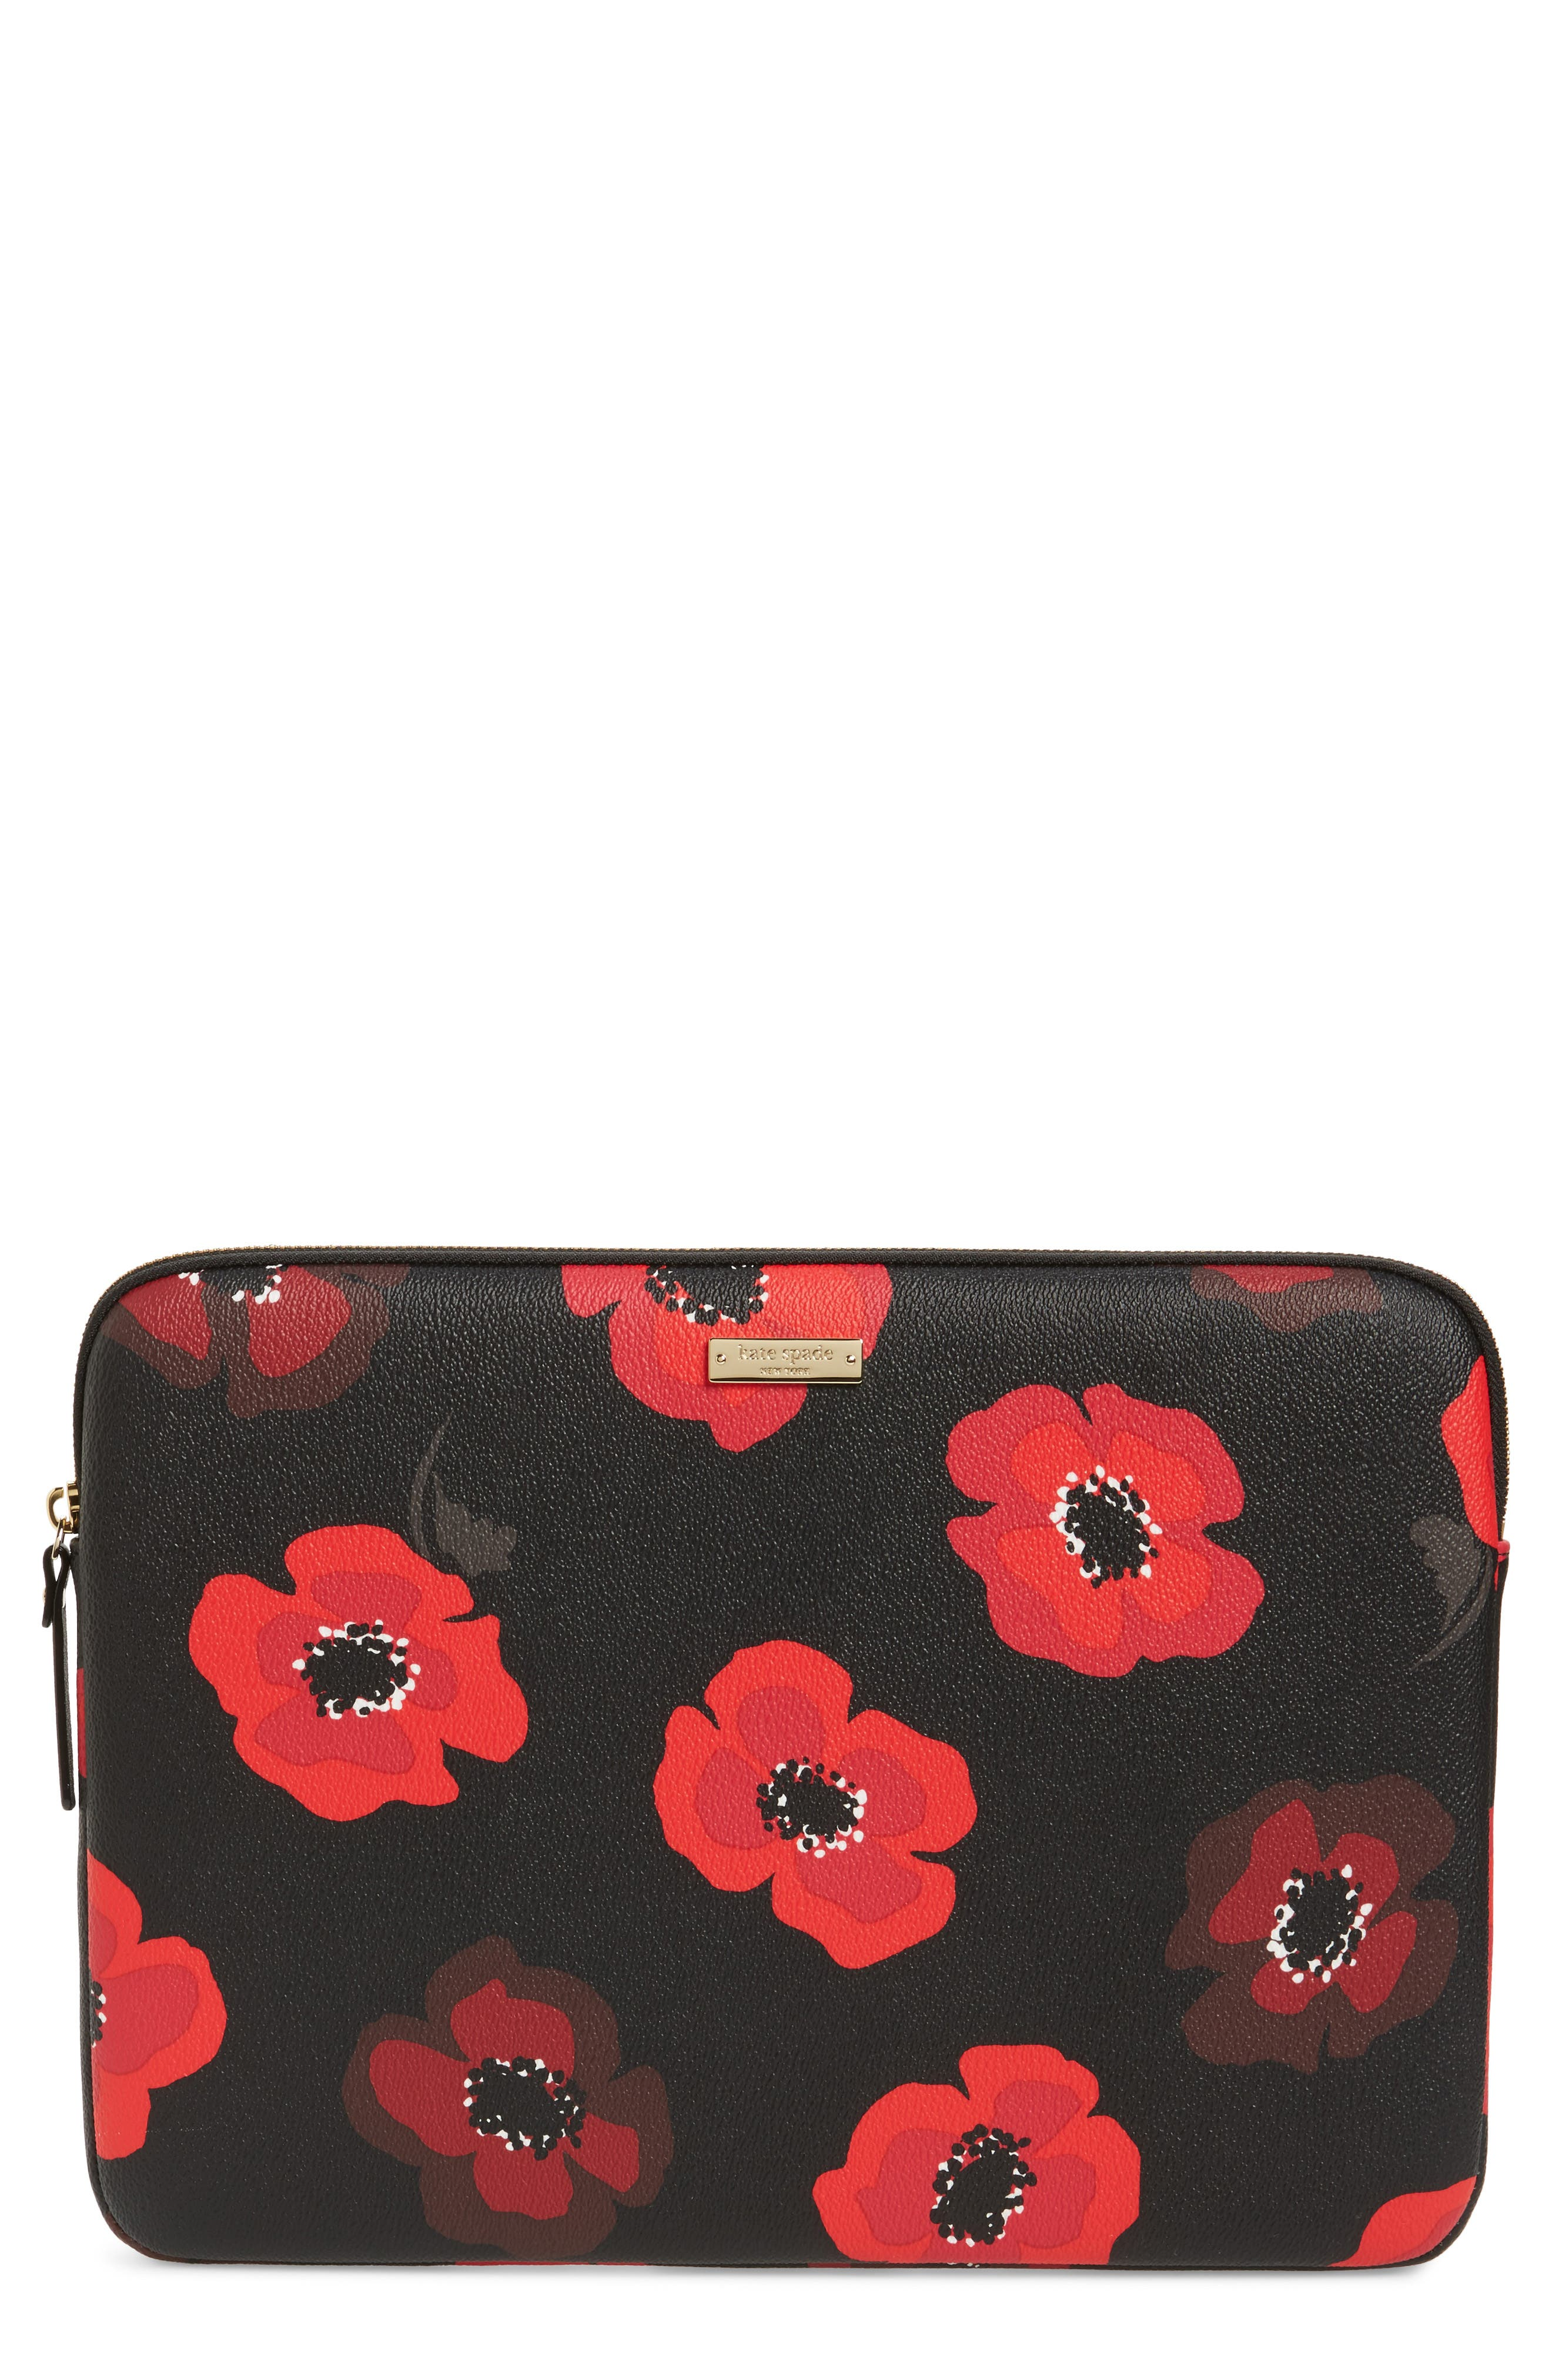 poppy 13-inch laptop sleeve,                             Main thumbnail 1, color,                             002